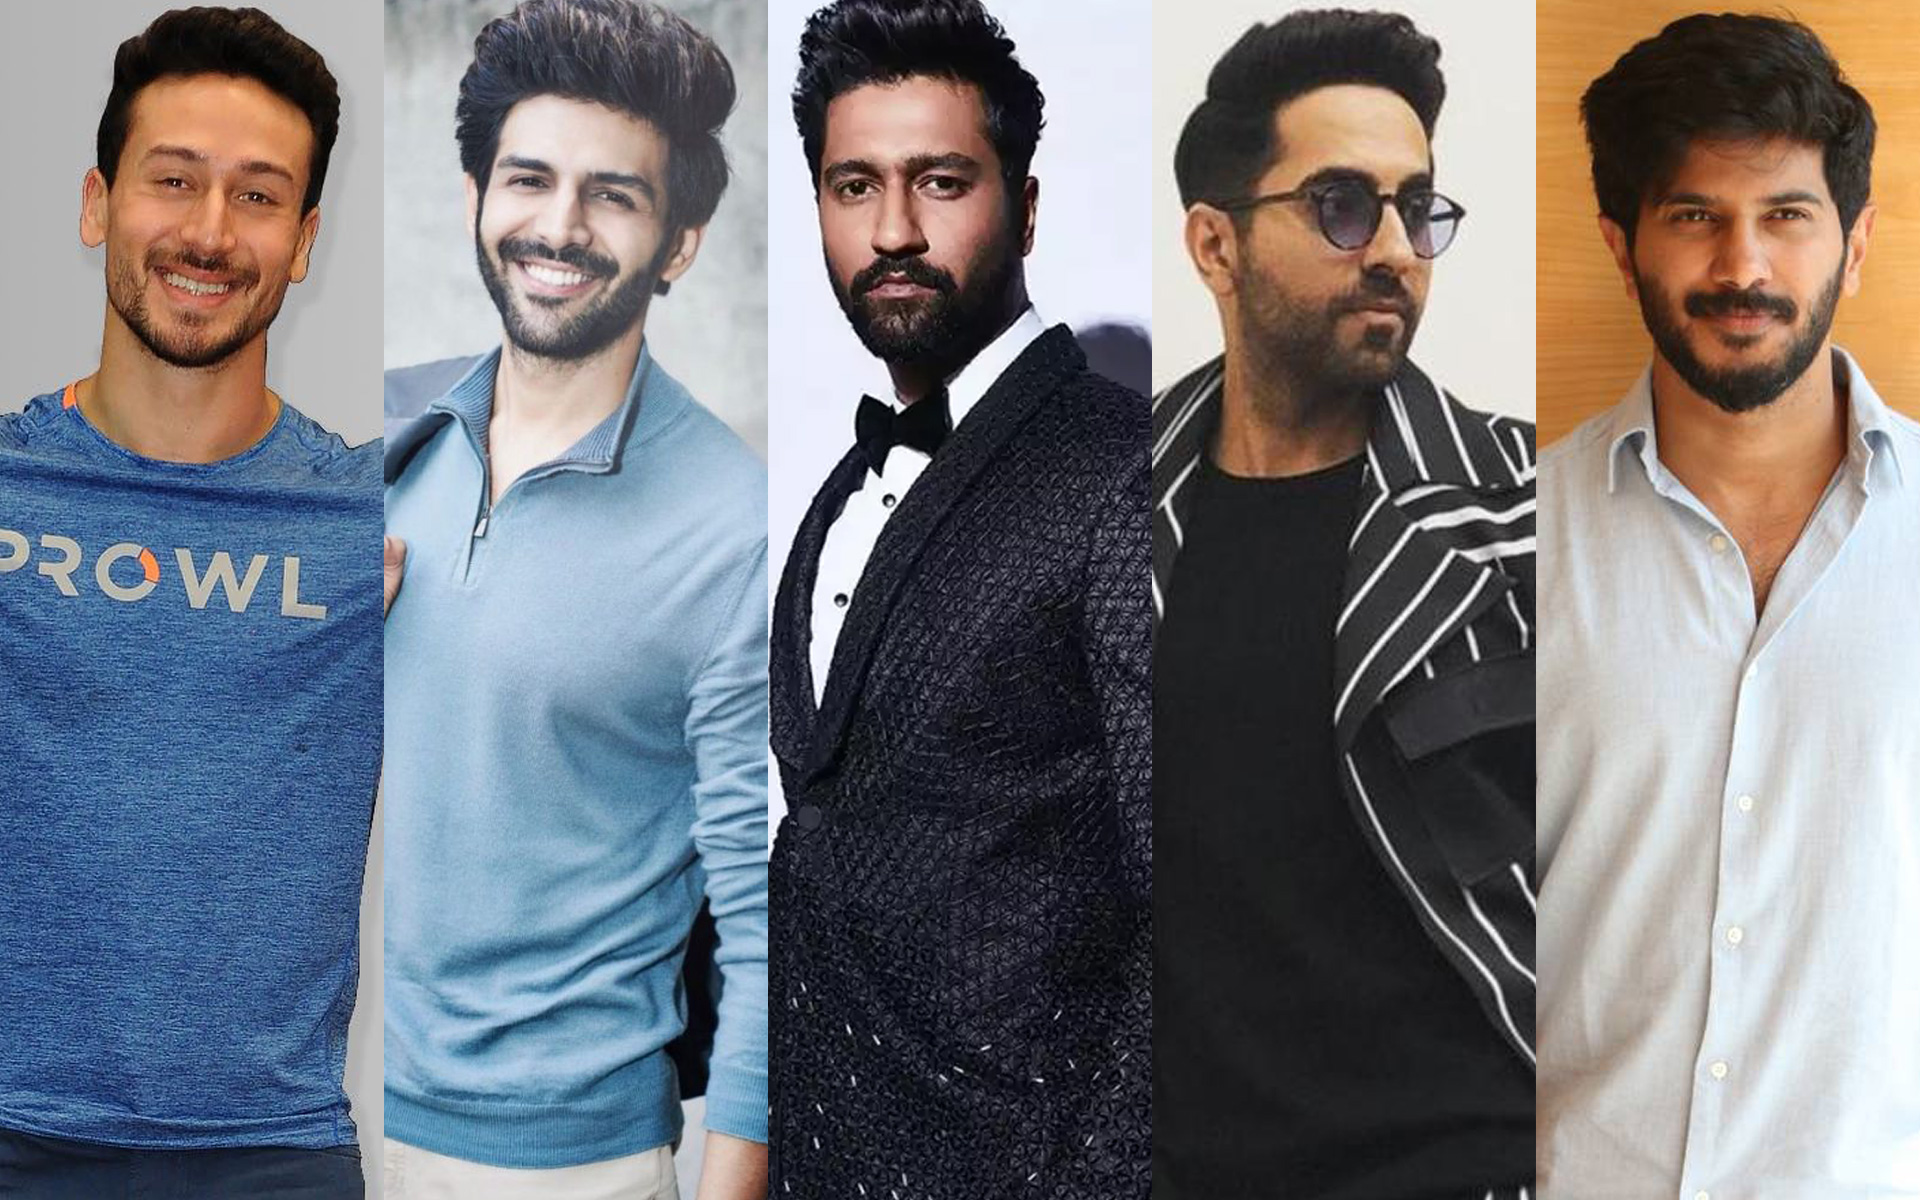 Tiger Shroff, Kartik Aaryan, Ayushmann Khurrana, Vicky Kaushal, Dulquer Salmaan - Heartthrobs Of Gen X